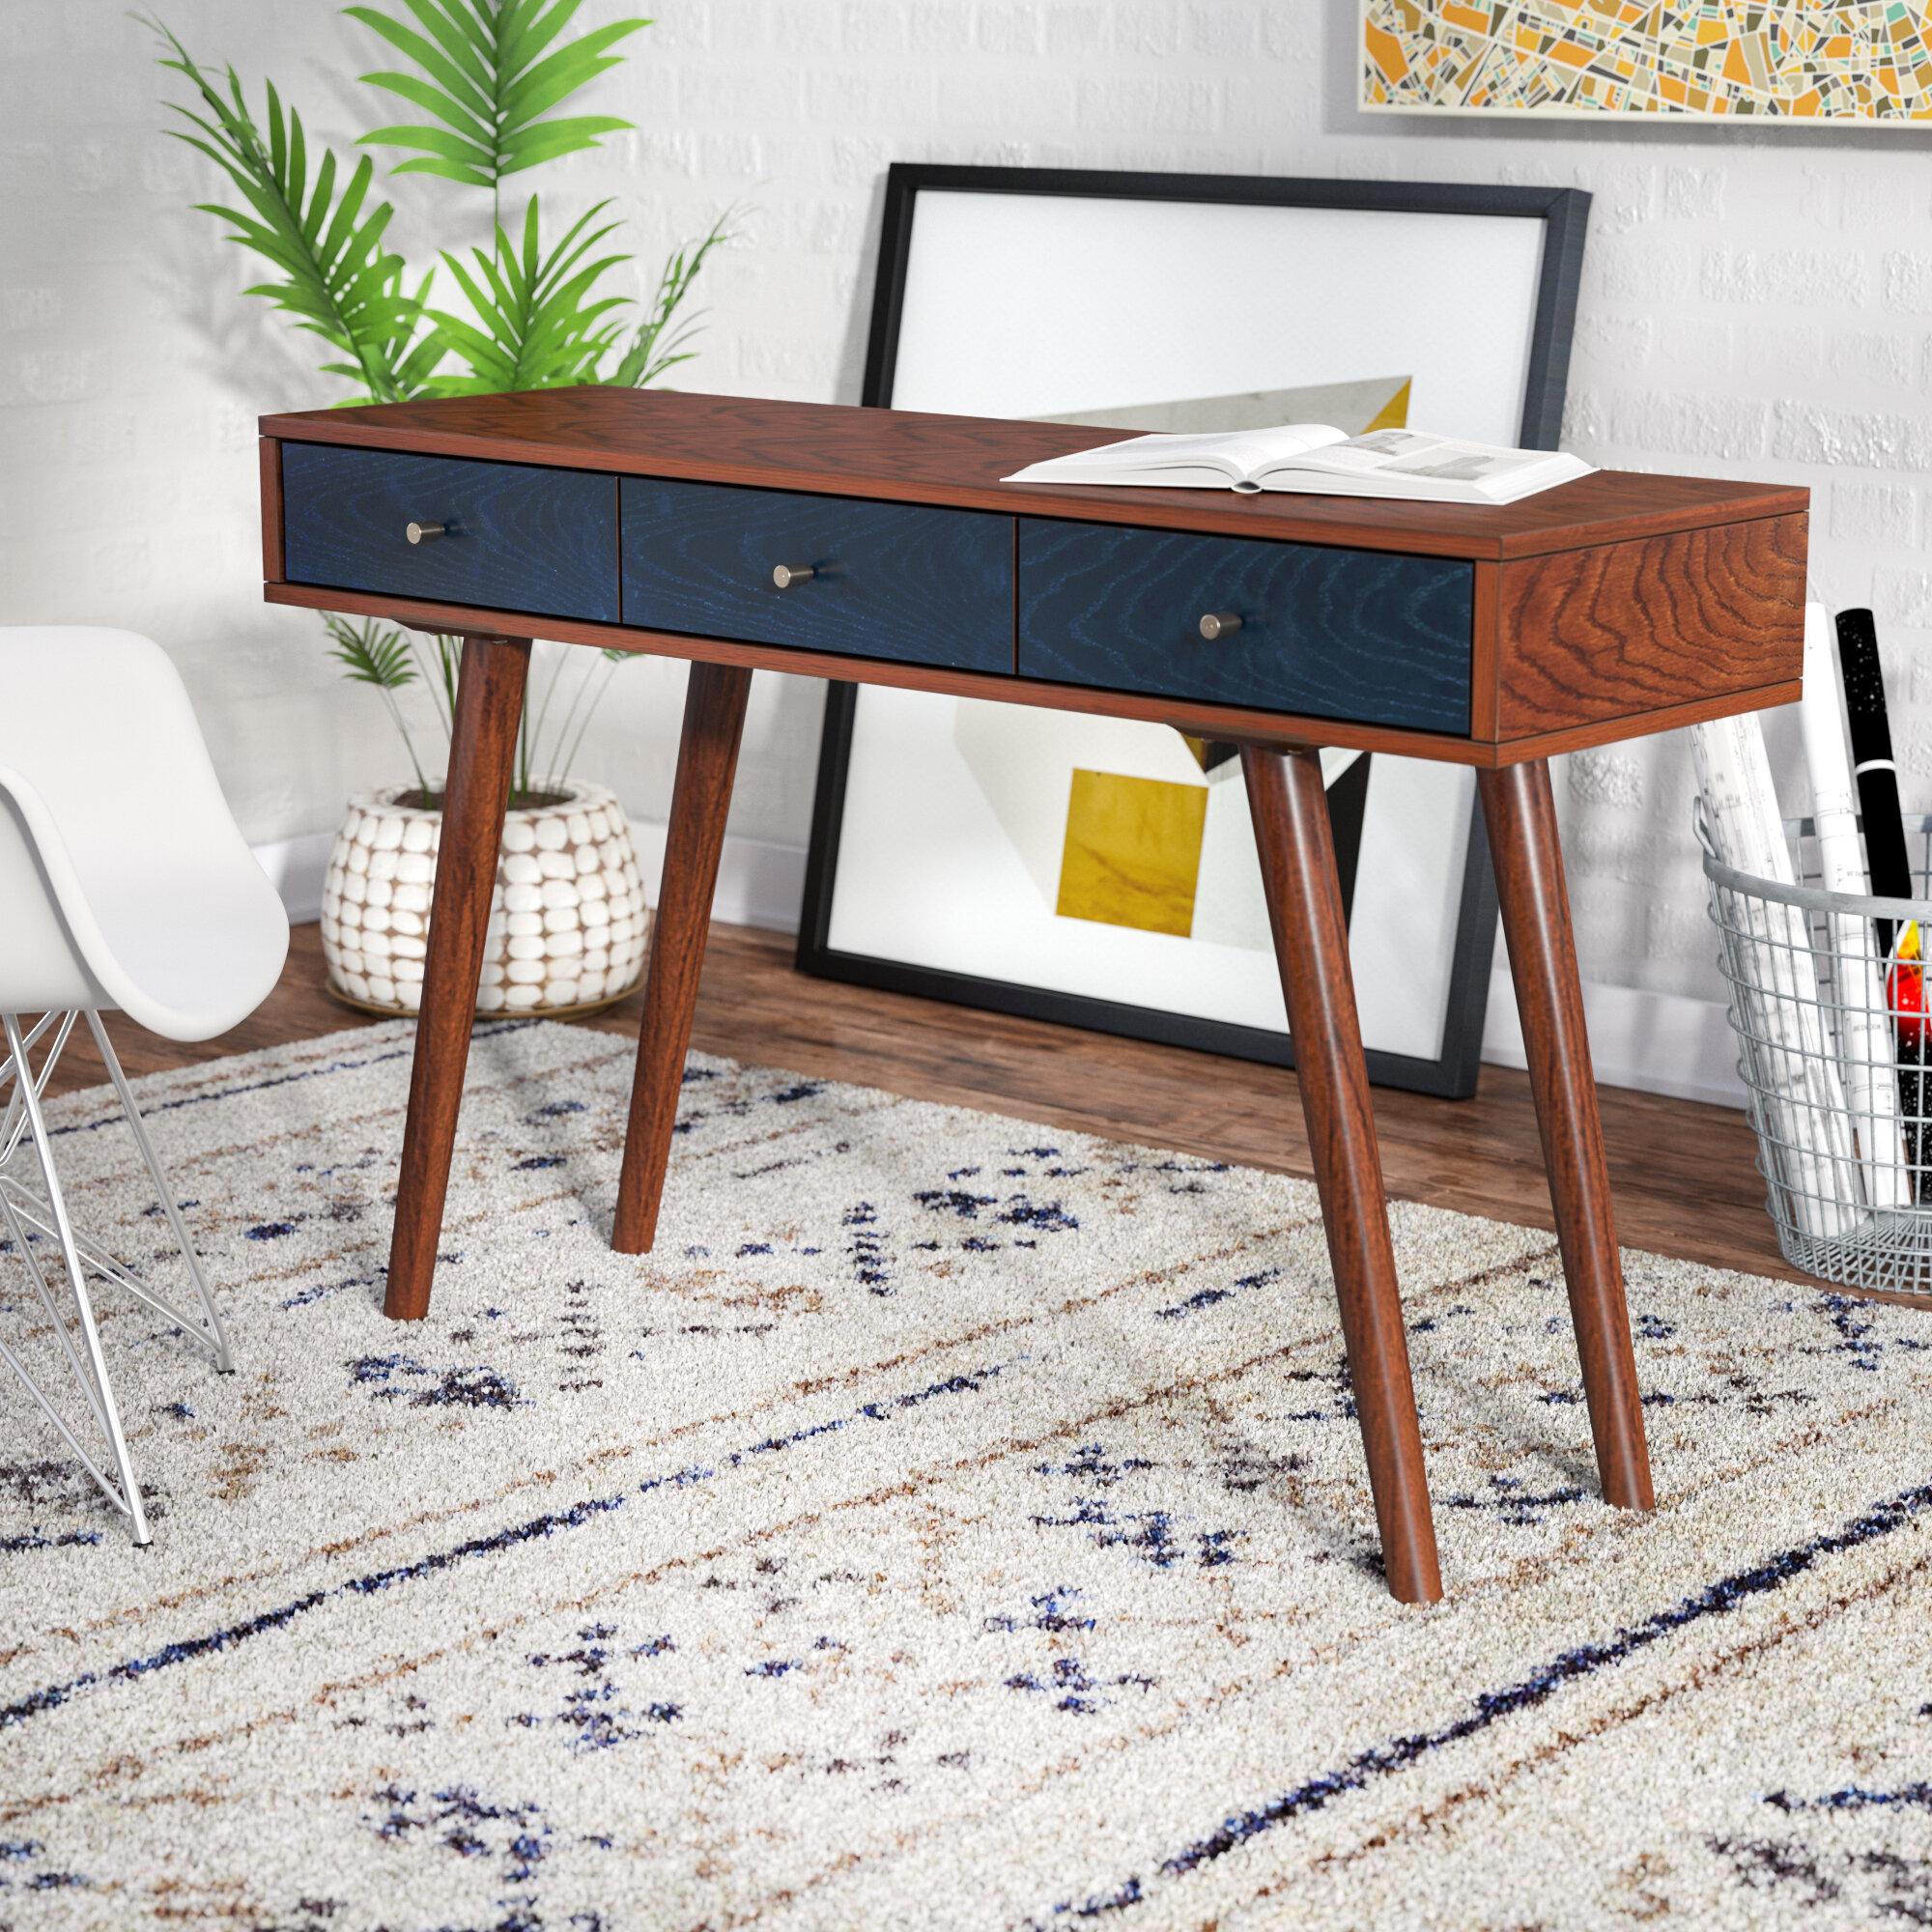 pdx drawers drawer desk myrtlewood wayfair rosecliff furniture heights writing